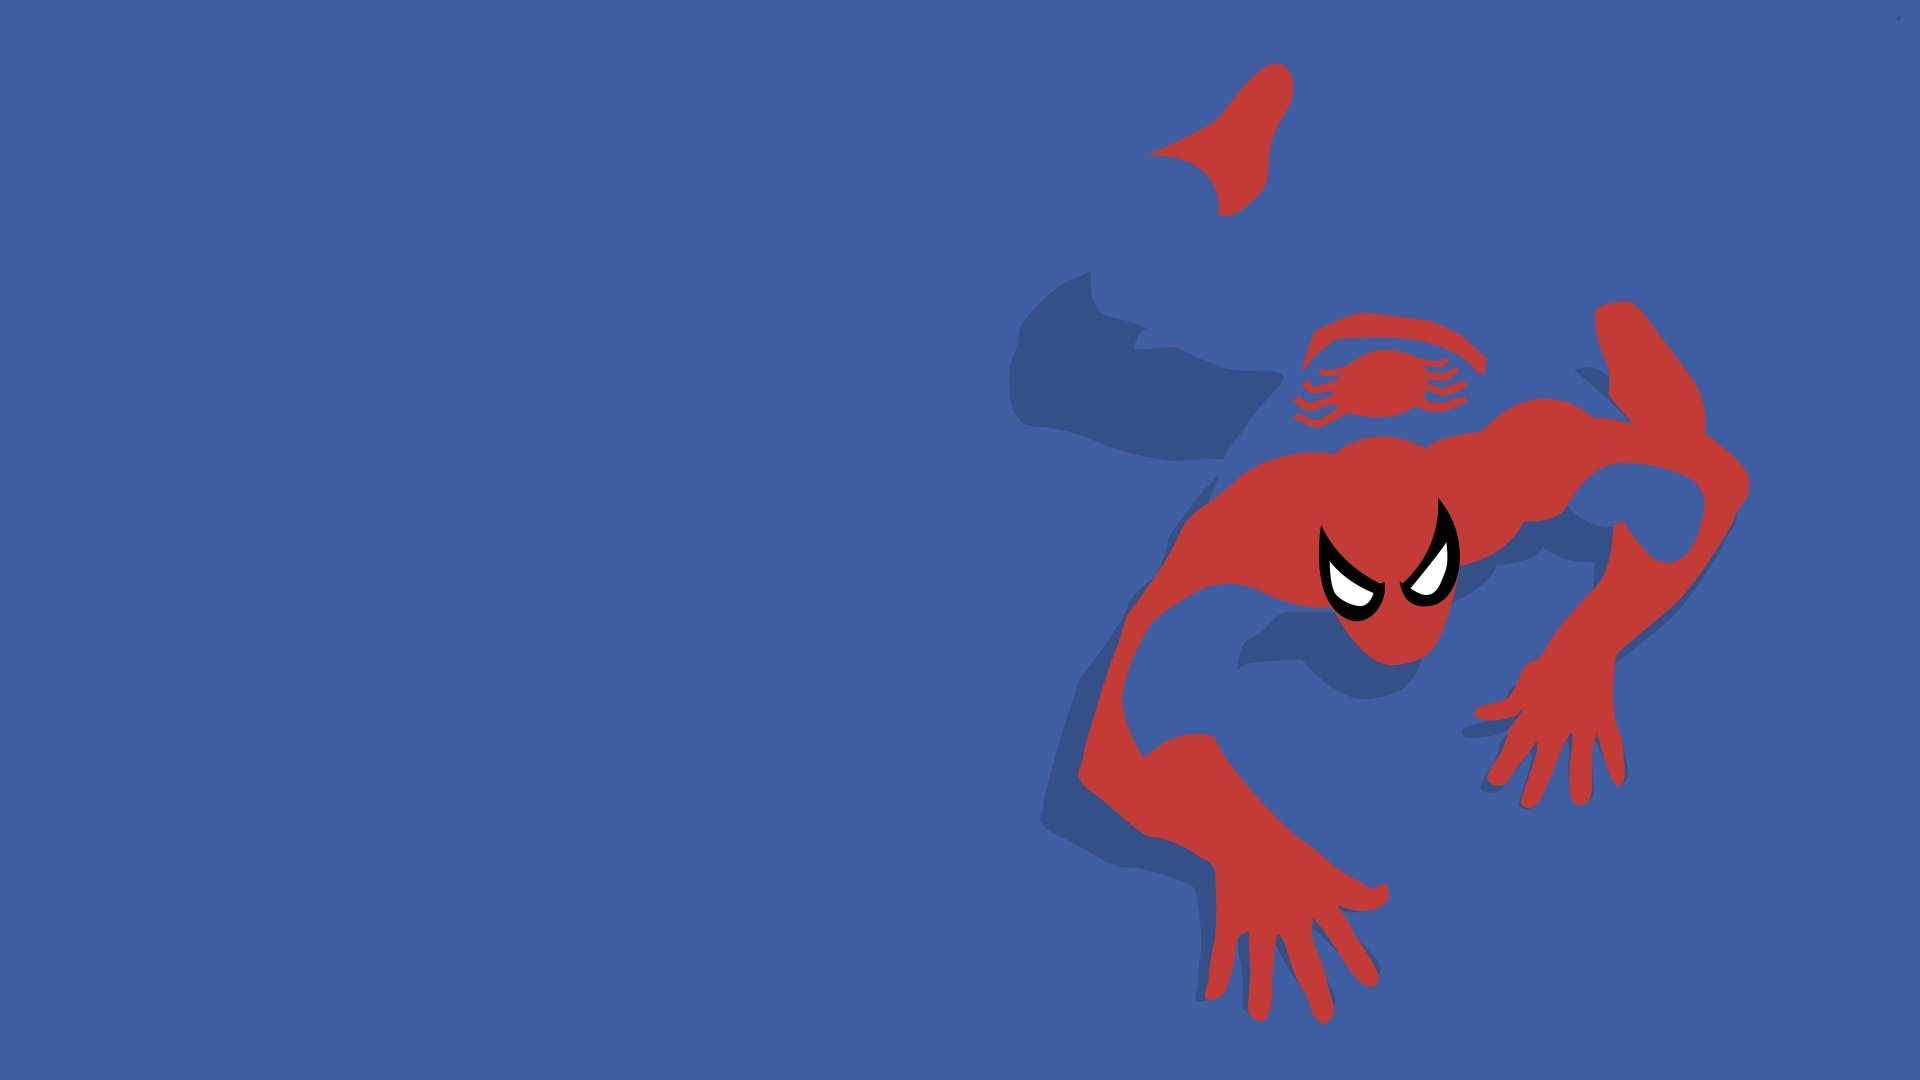 Wallpaper spider man spiderman marvel comics wallpapers minimalism 1680x1050